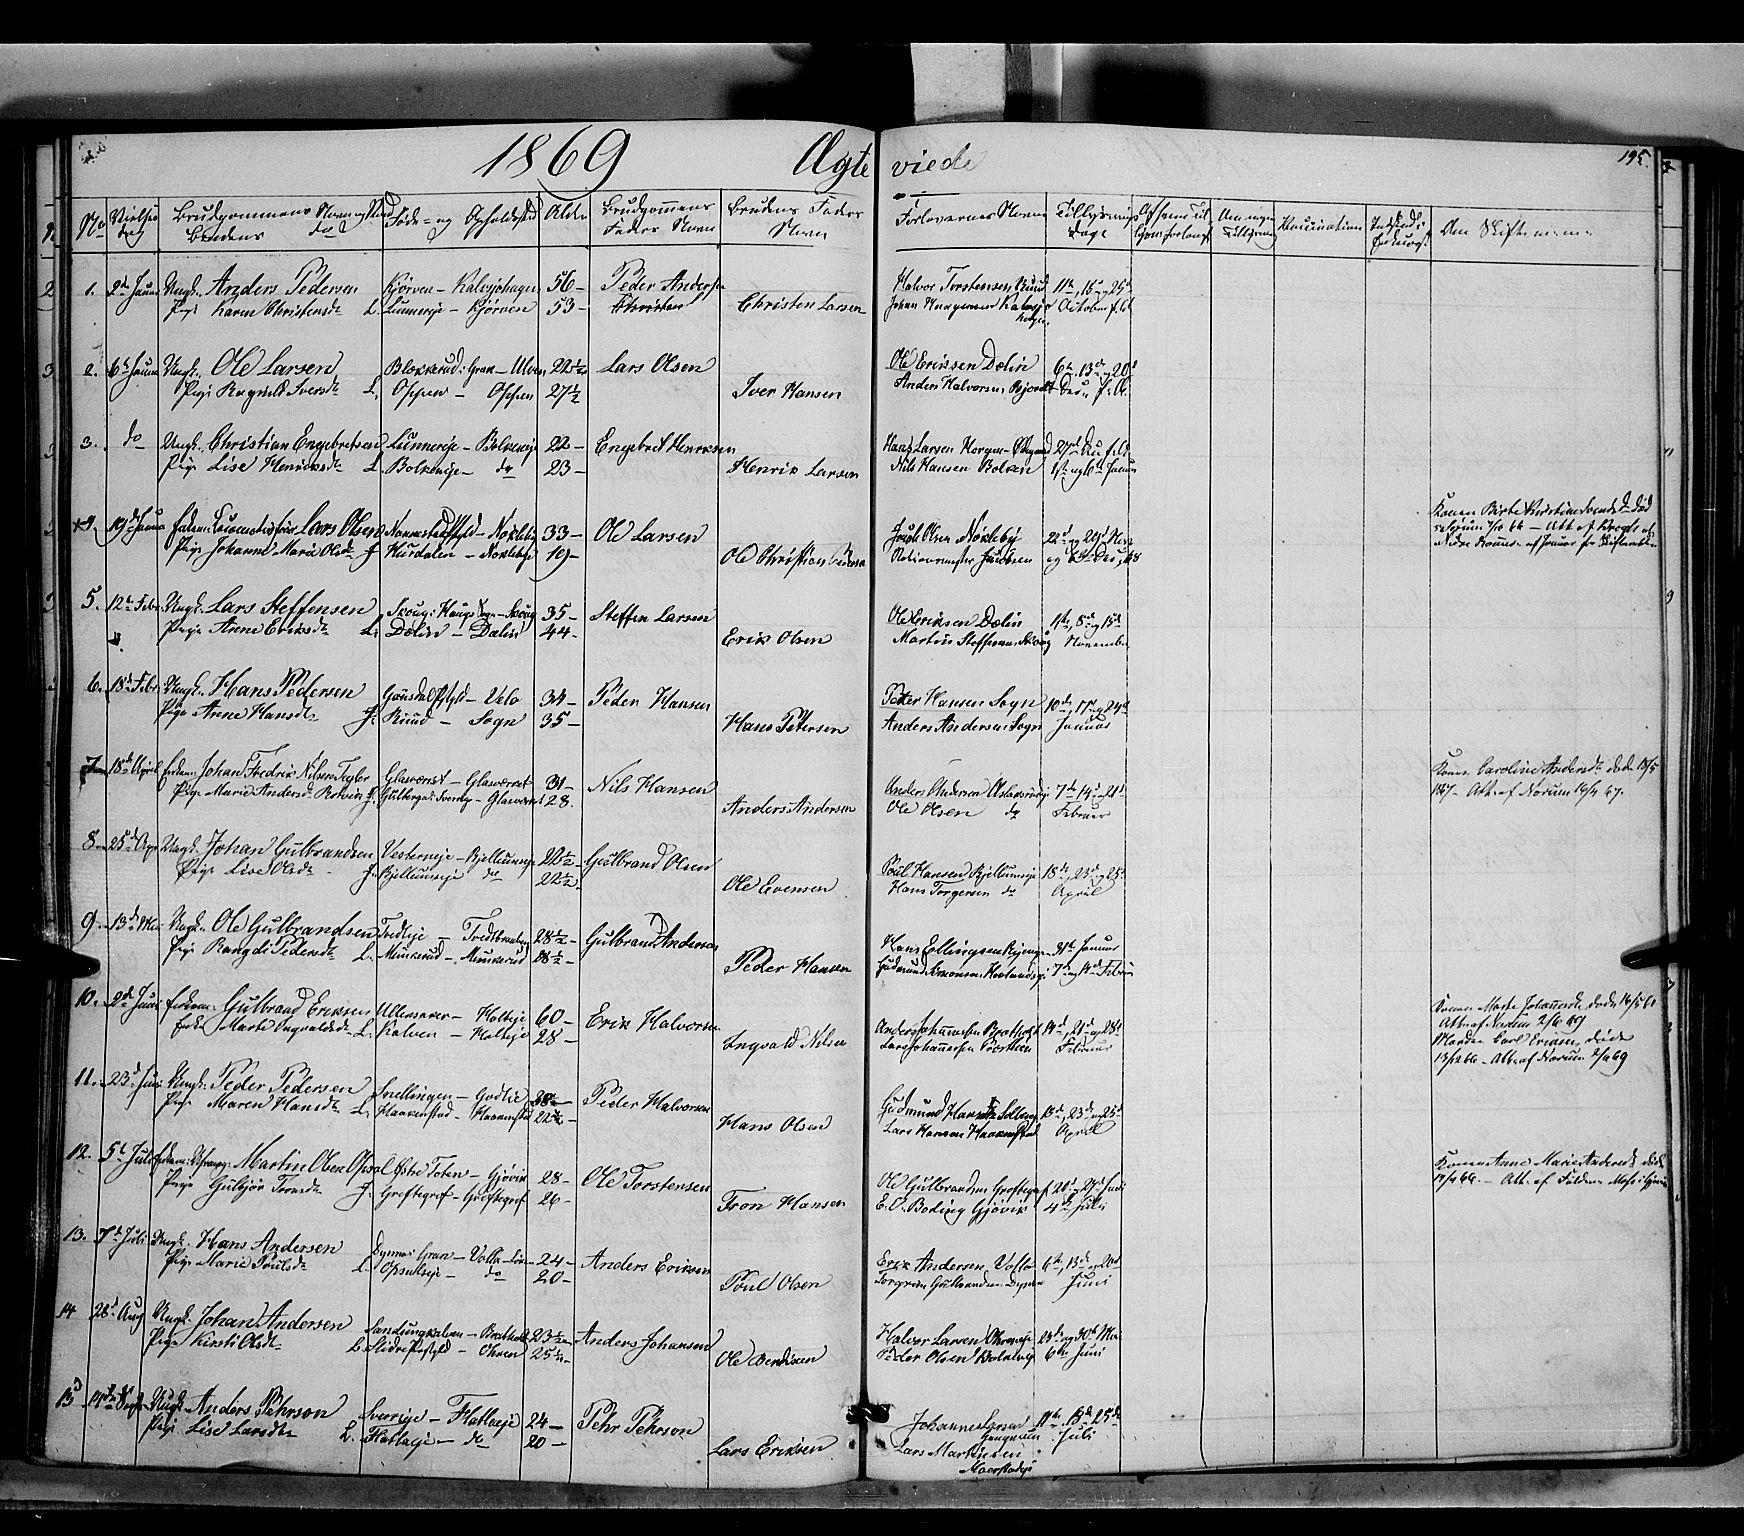 SAH, Jevnaker prestekontor, Ministerialbok nr. 7, 1858-1876, s. 195